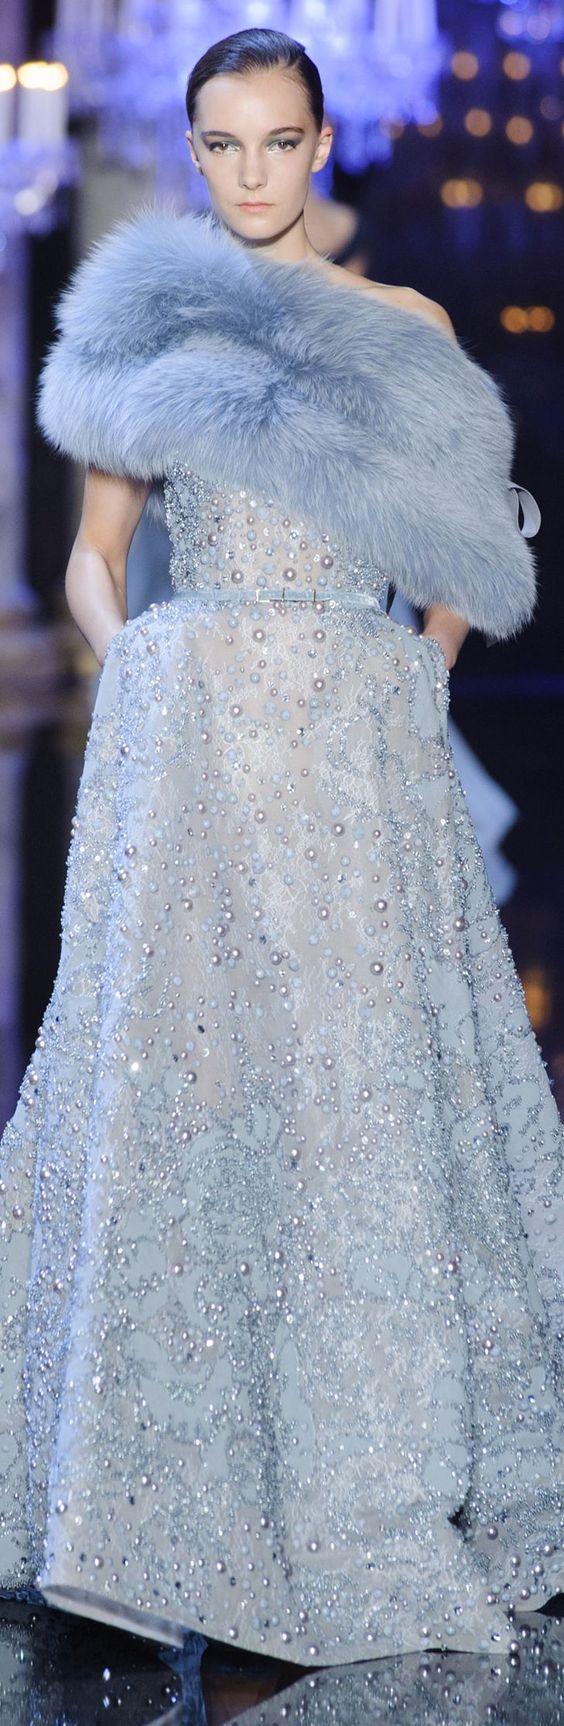 Elie Saab •☆•*¨*•¸¸¸.•*¨*•☆ exquisite dress and blue color